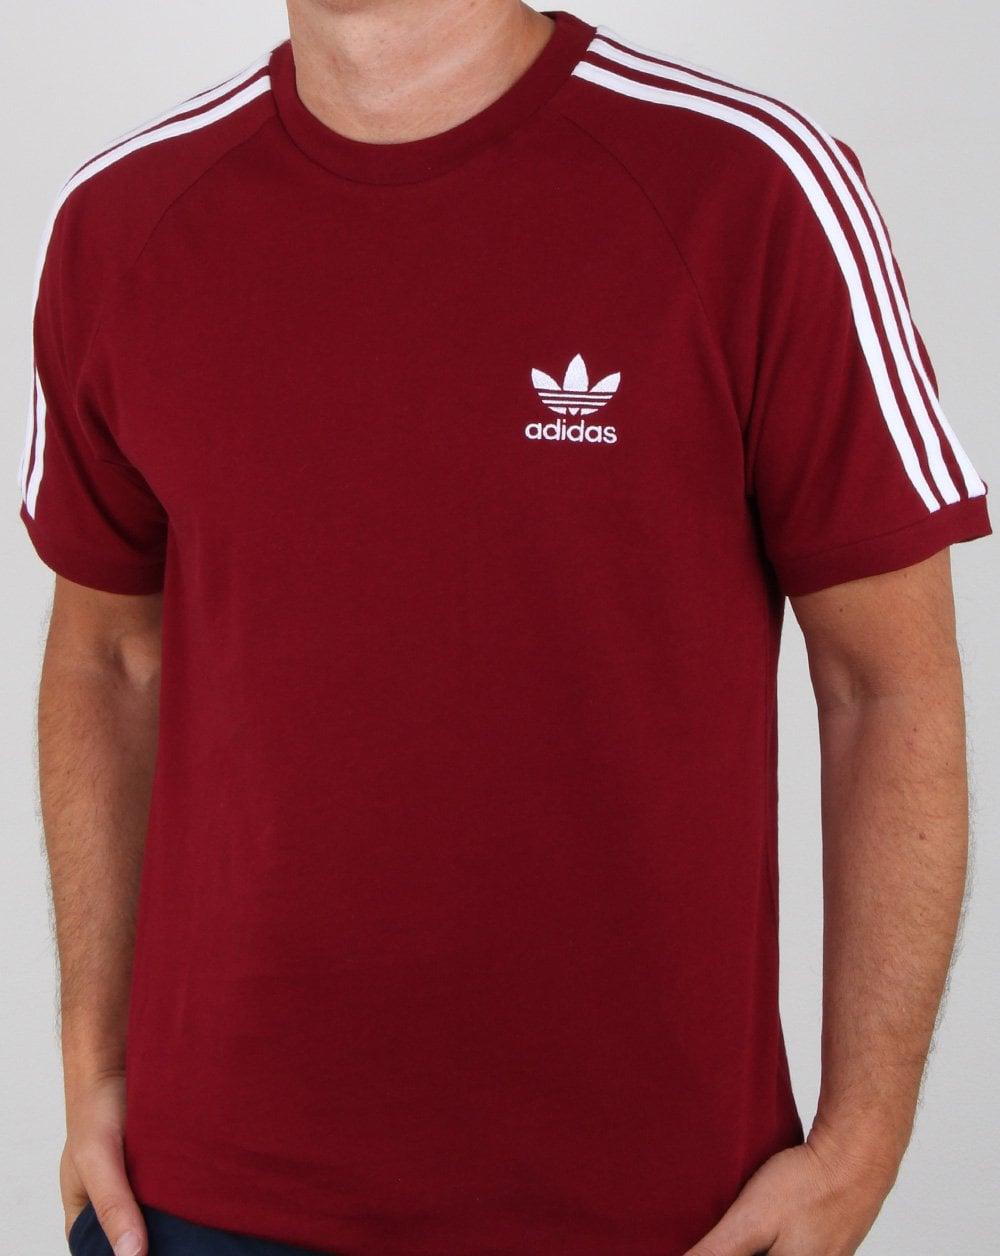 adidas 3 stripes shirt trace maroon